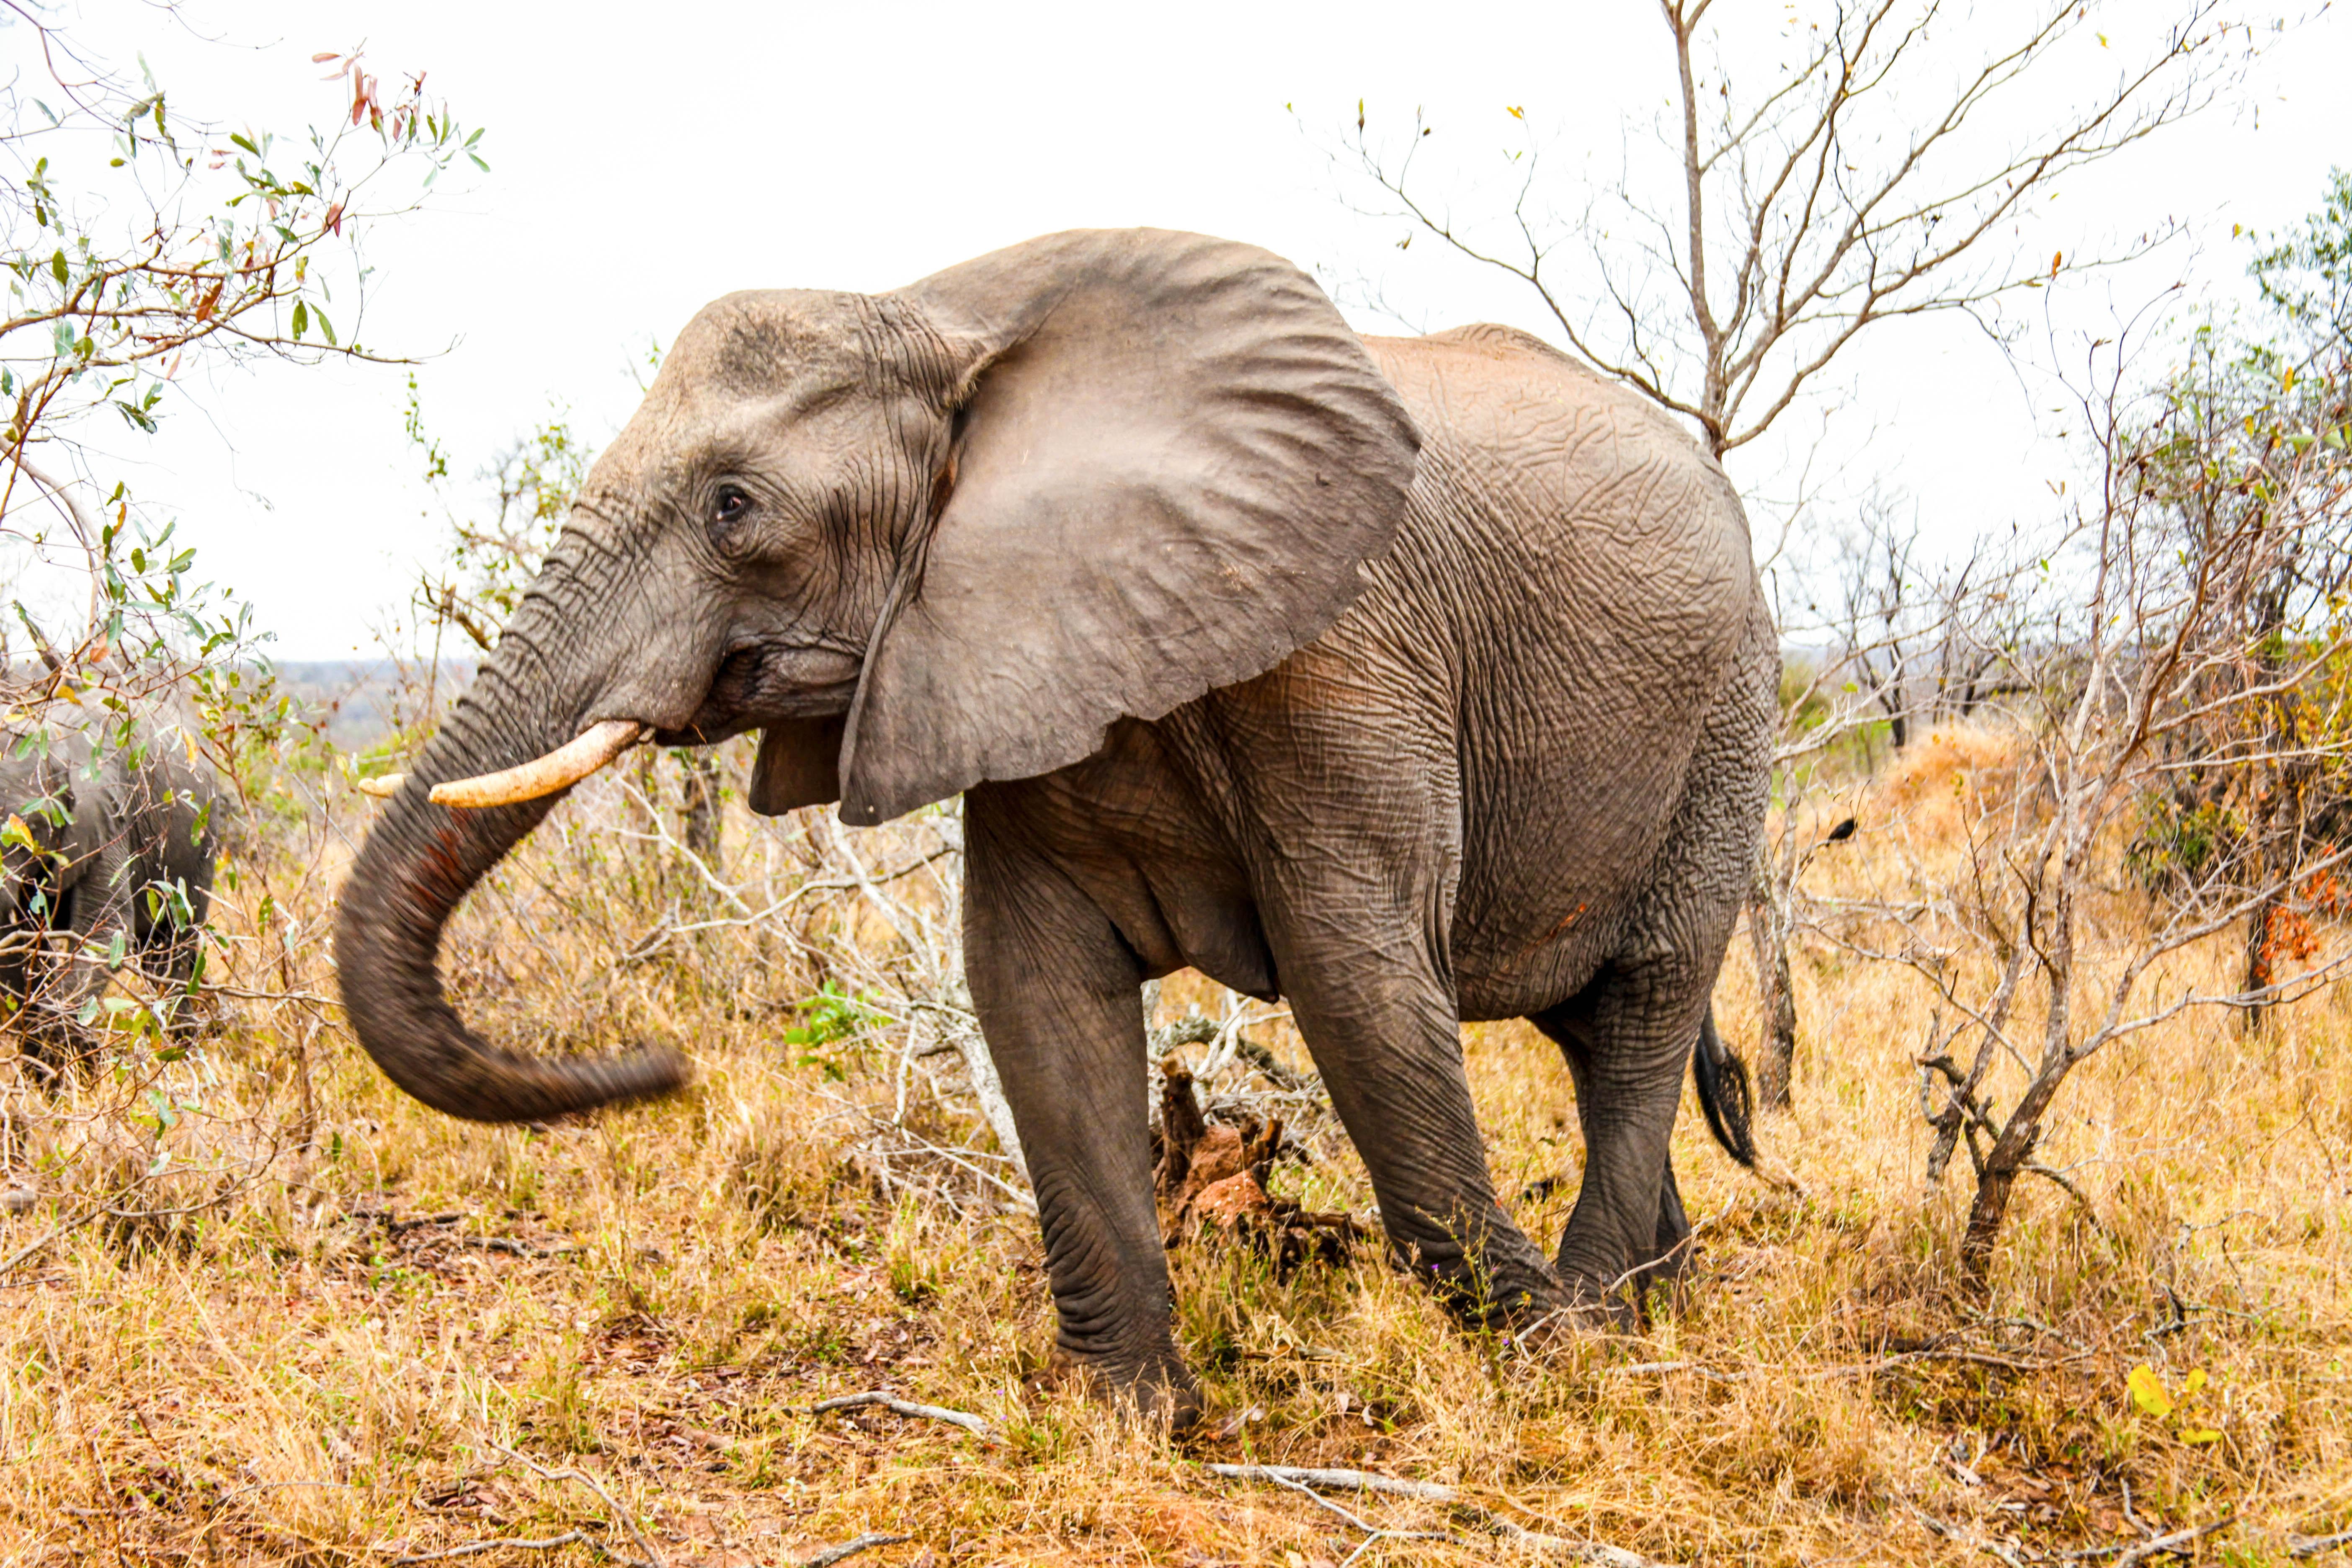 An elephant walking around.